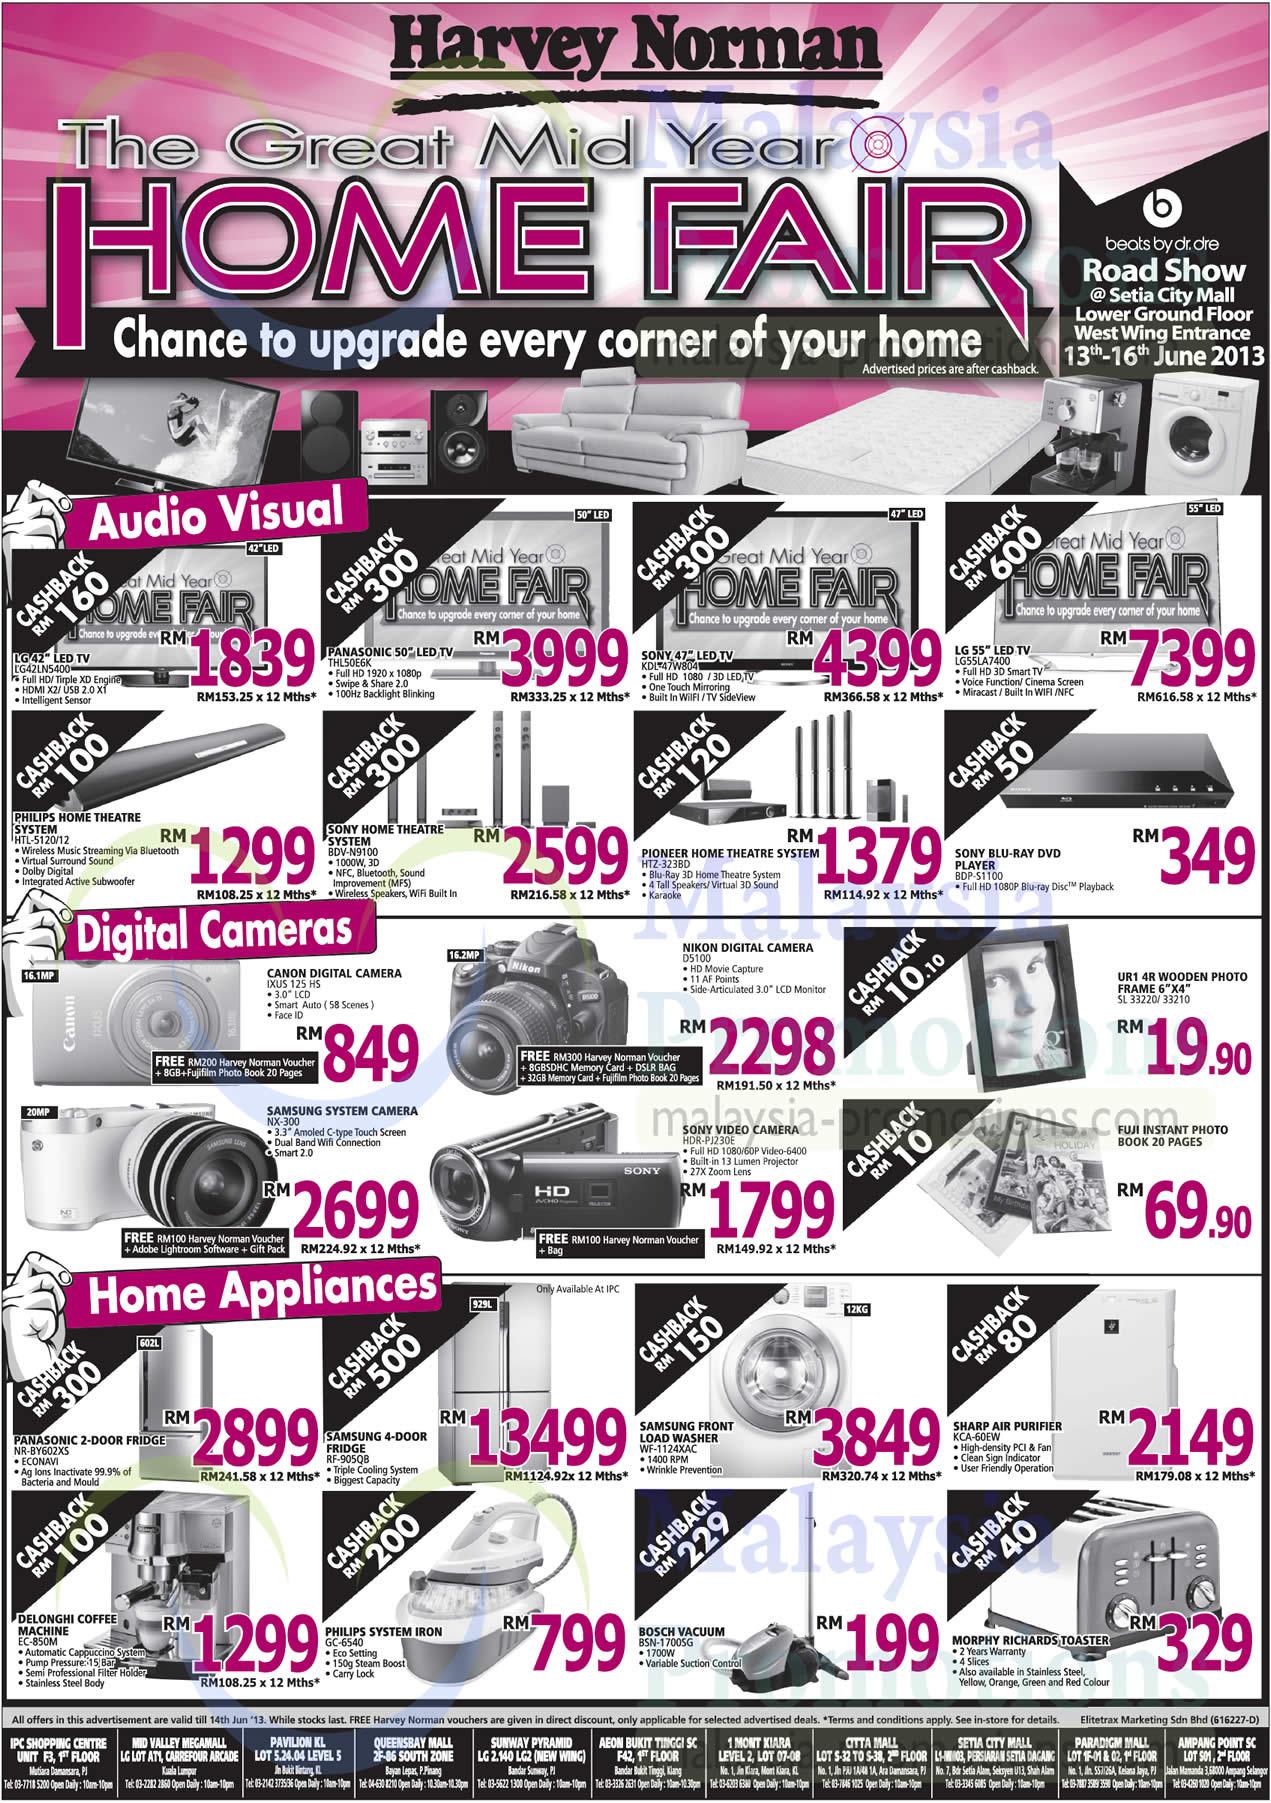 sony tv harvey norman. harvey norman digital cameras, furniture, notebooks \u0026 more offers 8 \u2013 14 jun 2013 sony tv